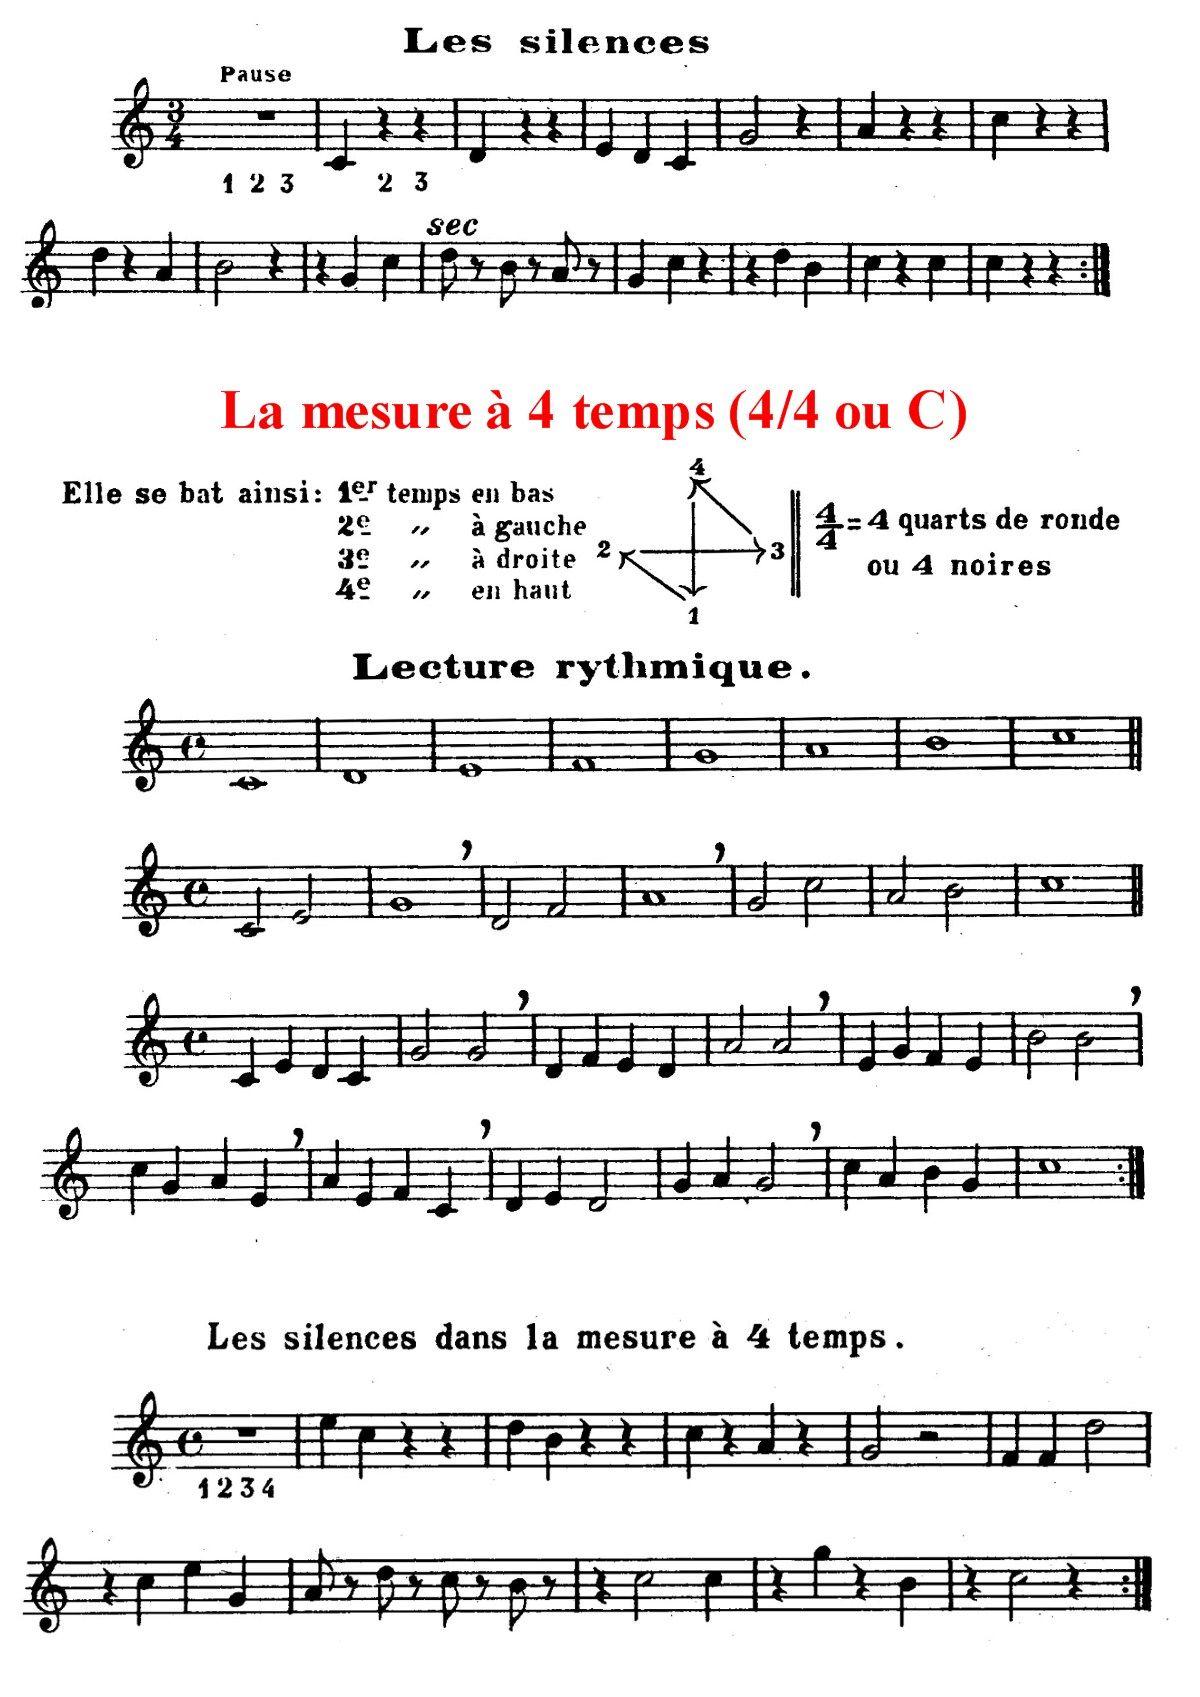 le solfège pratique | muzik en 2019 | Solfège, Solfège ...